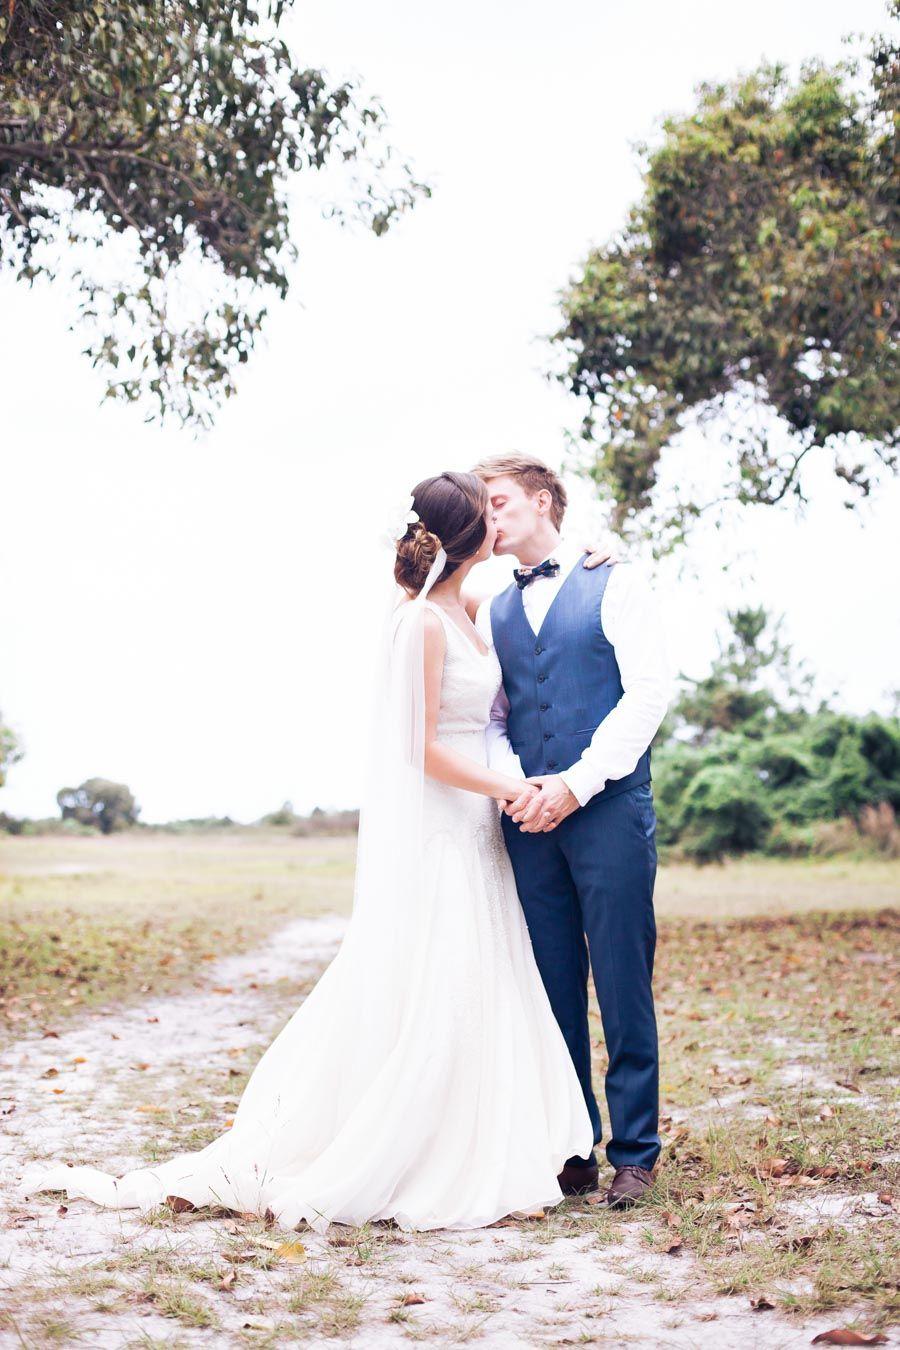 Inspire Blog – Casamentos Casamento no campo de Branca e Mark - Inspire Blog - Casamentos